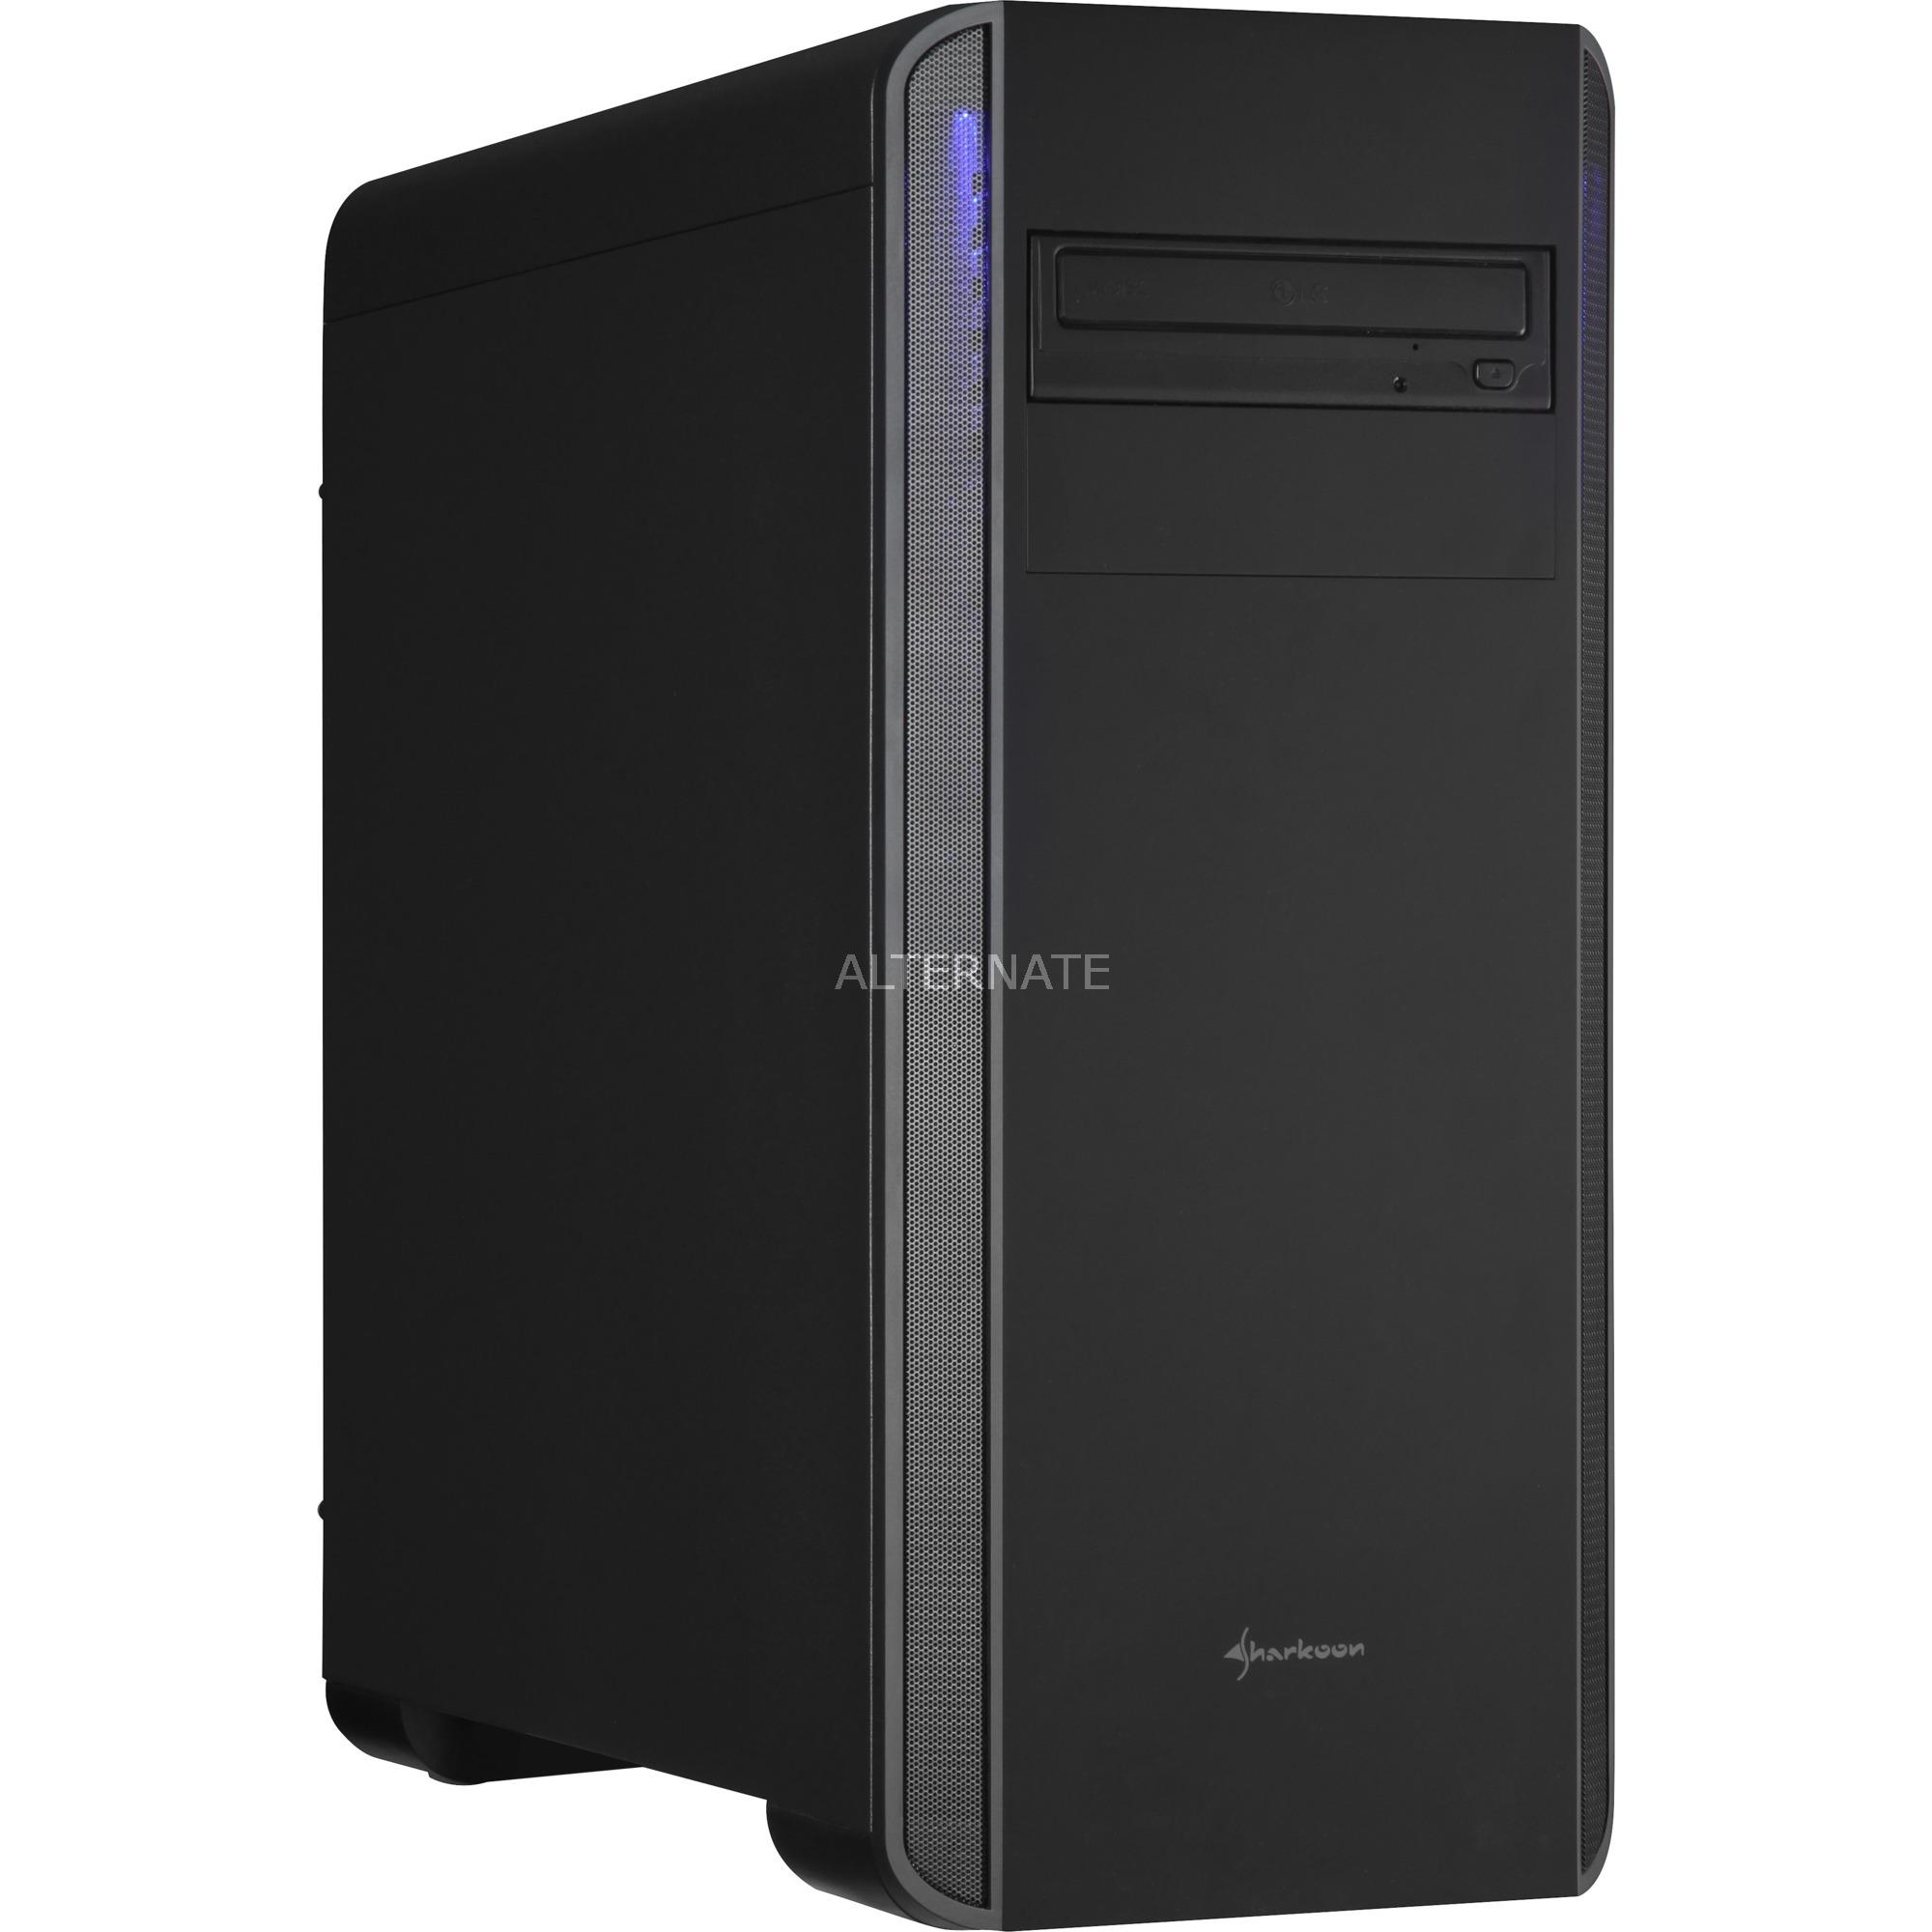 RYZEN PRO 1700X, Komplett-PC - Preisvergleich